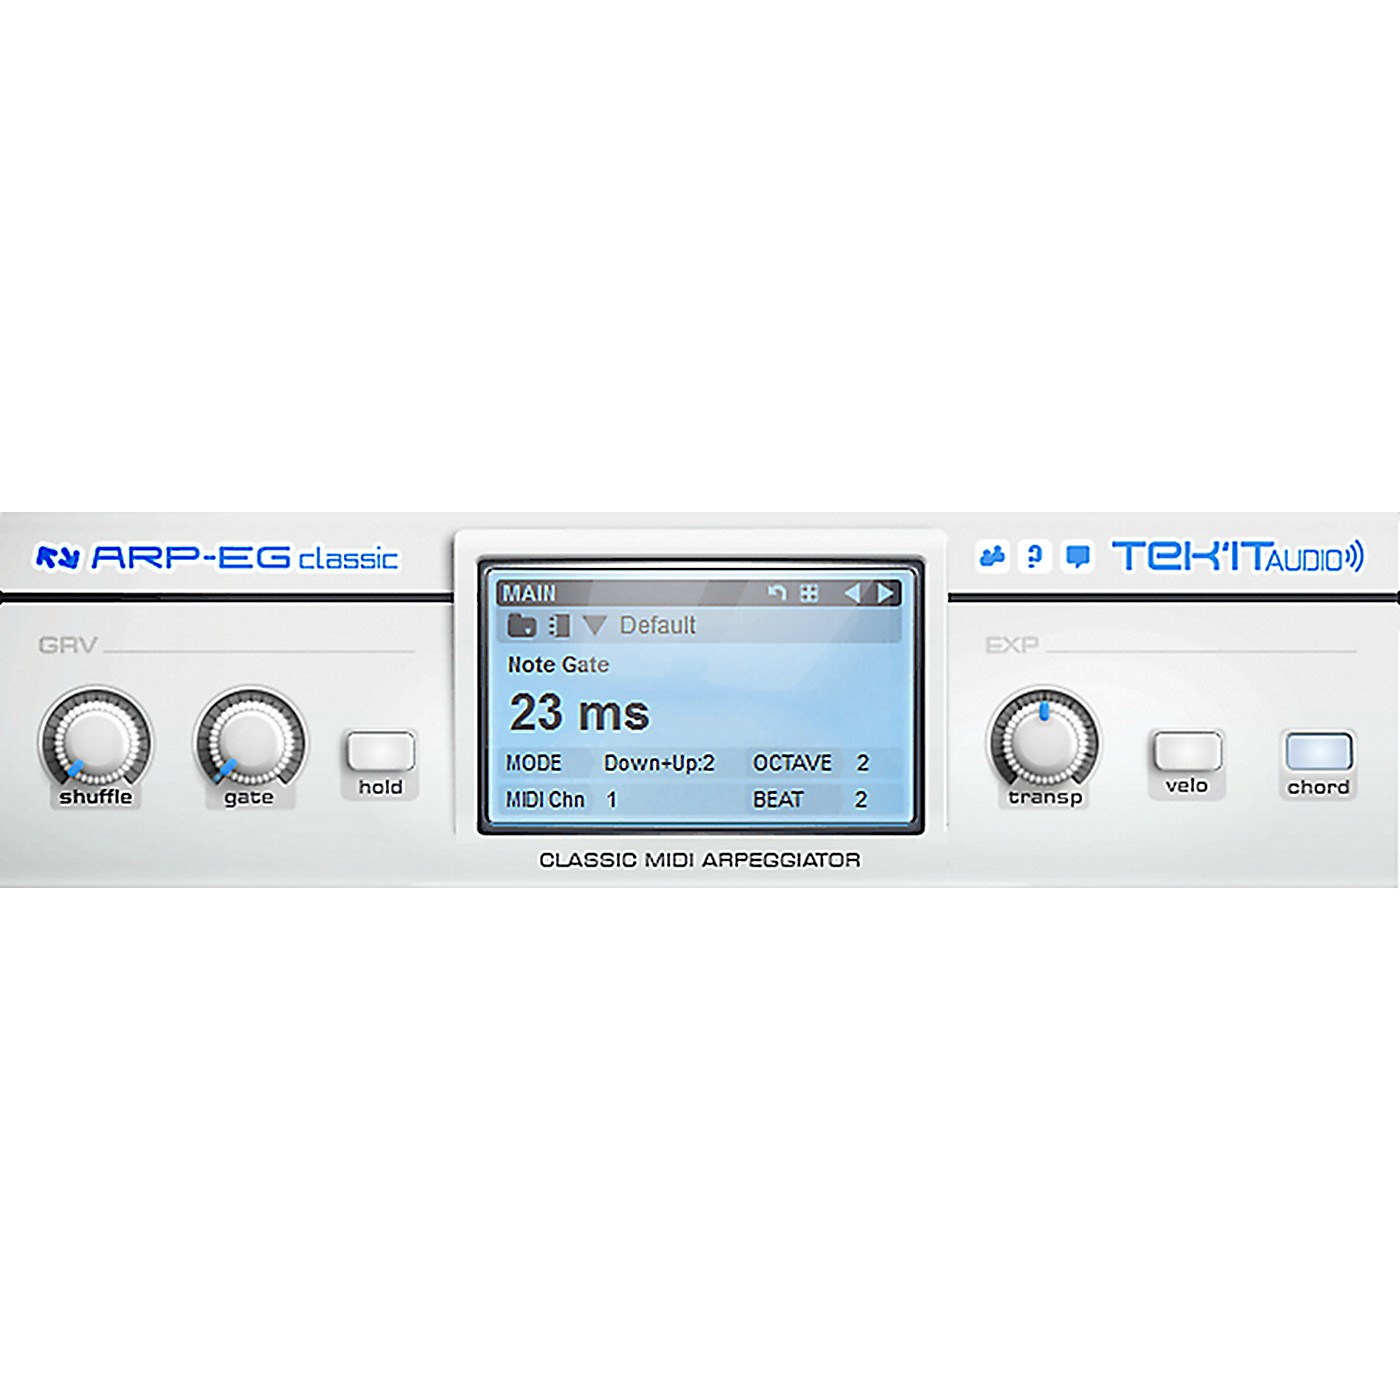 Tek'it Audio Arp-EG Classic Arpeggiator Plug-in Software Download thumbnail